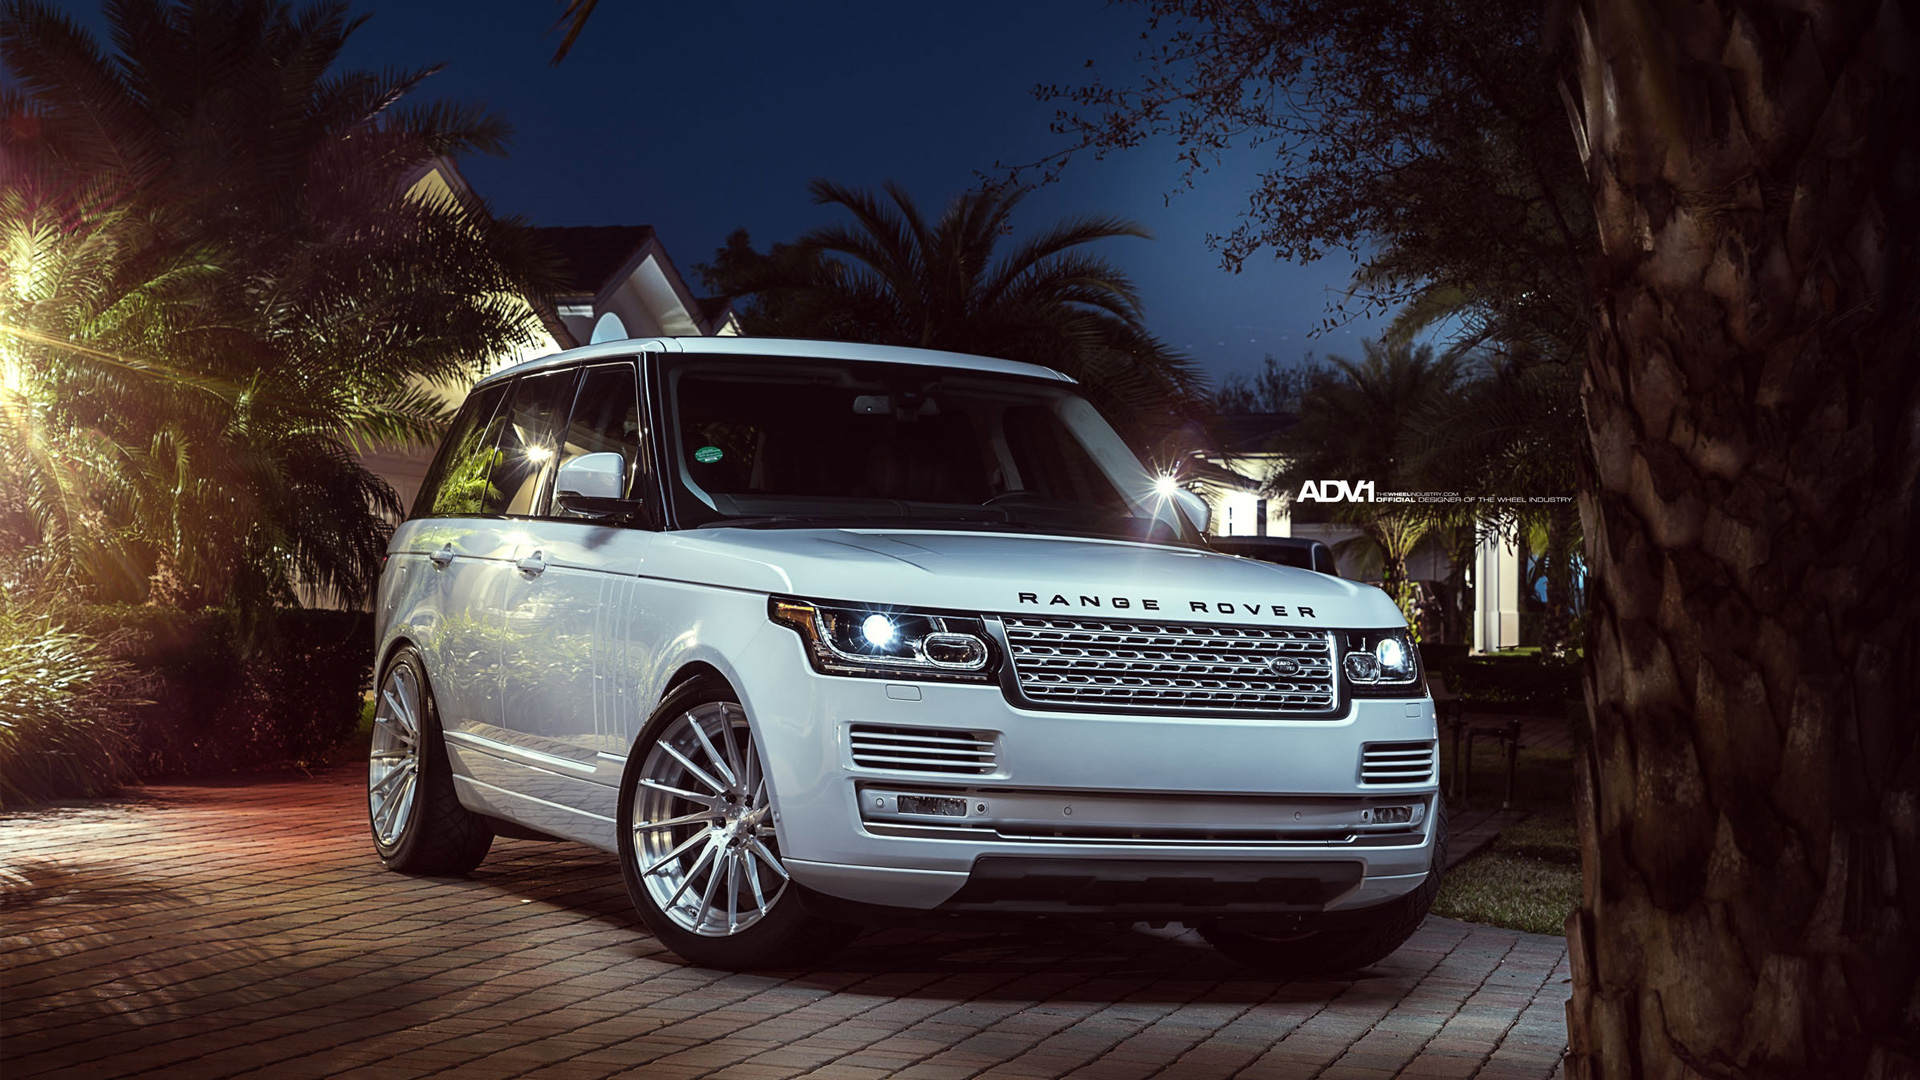 Range Rover Hse Adv15r Wallpaper Hd Car Wallpapers Id 6321